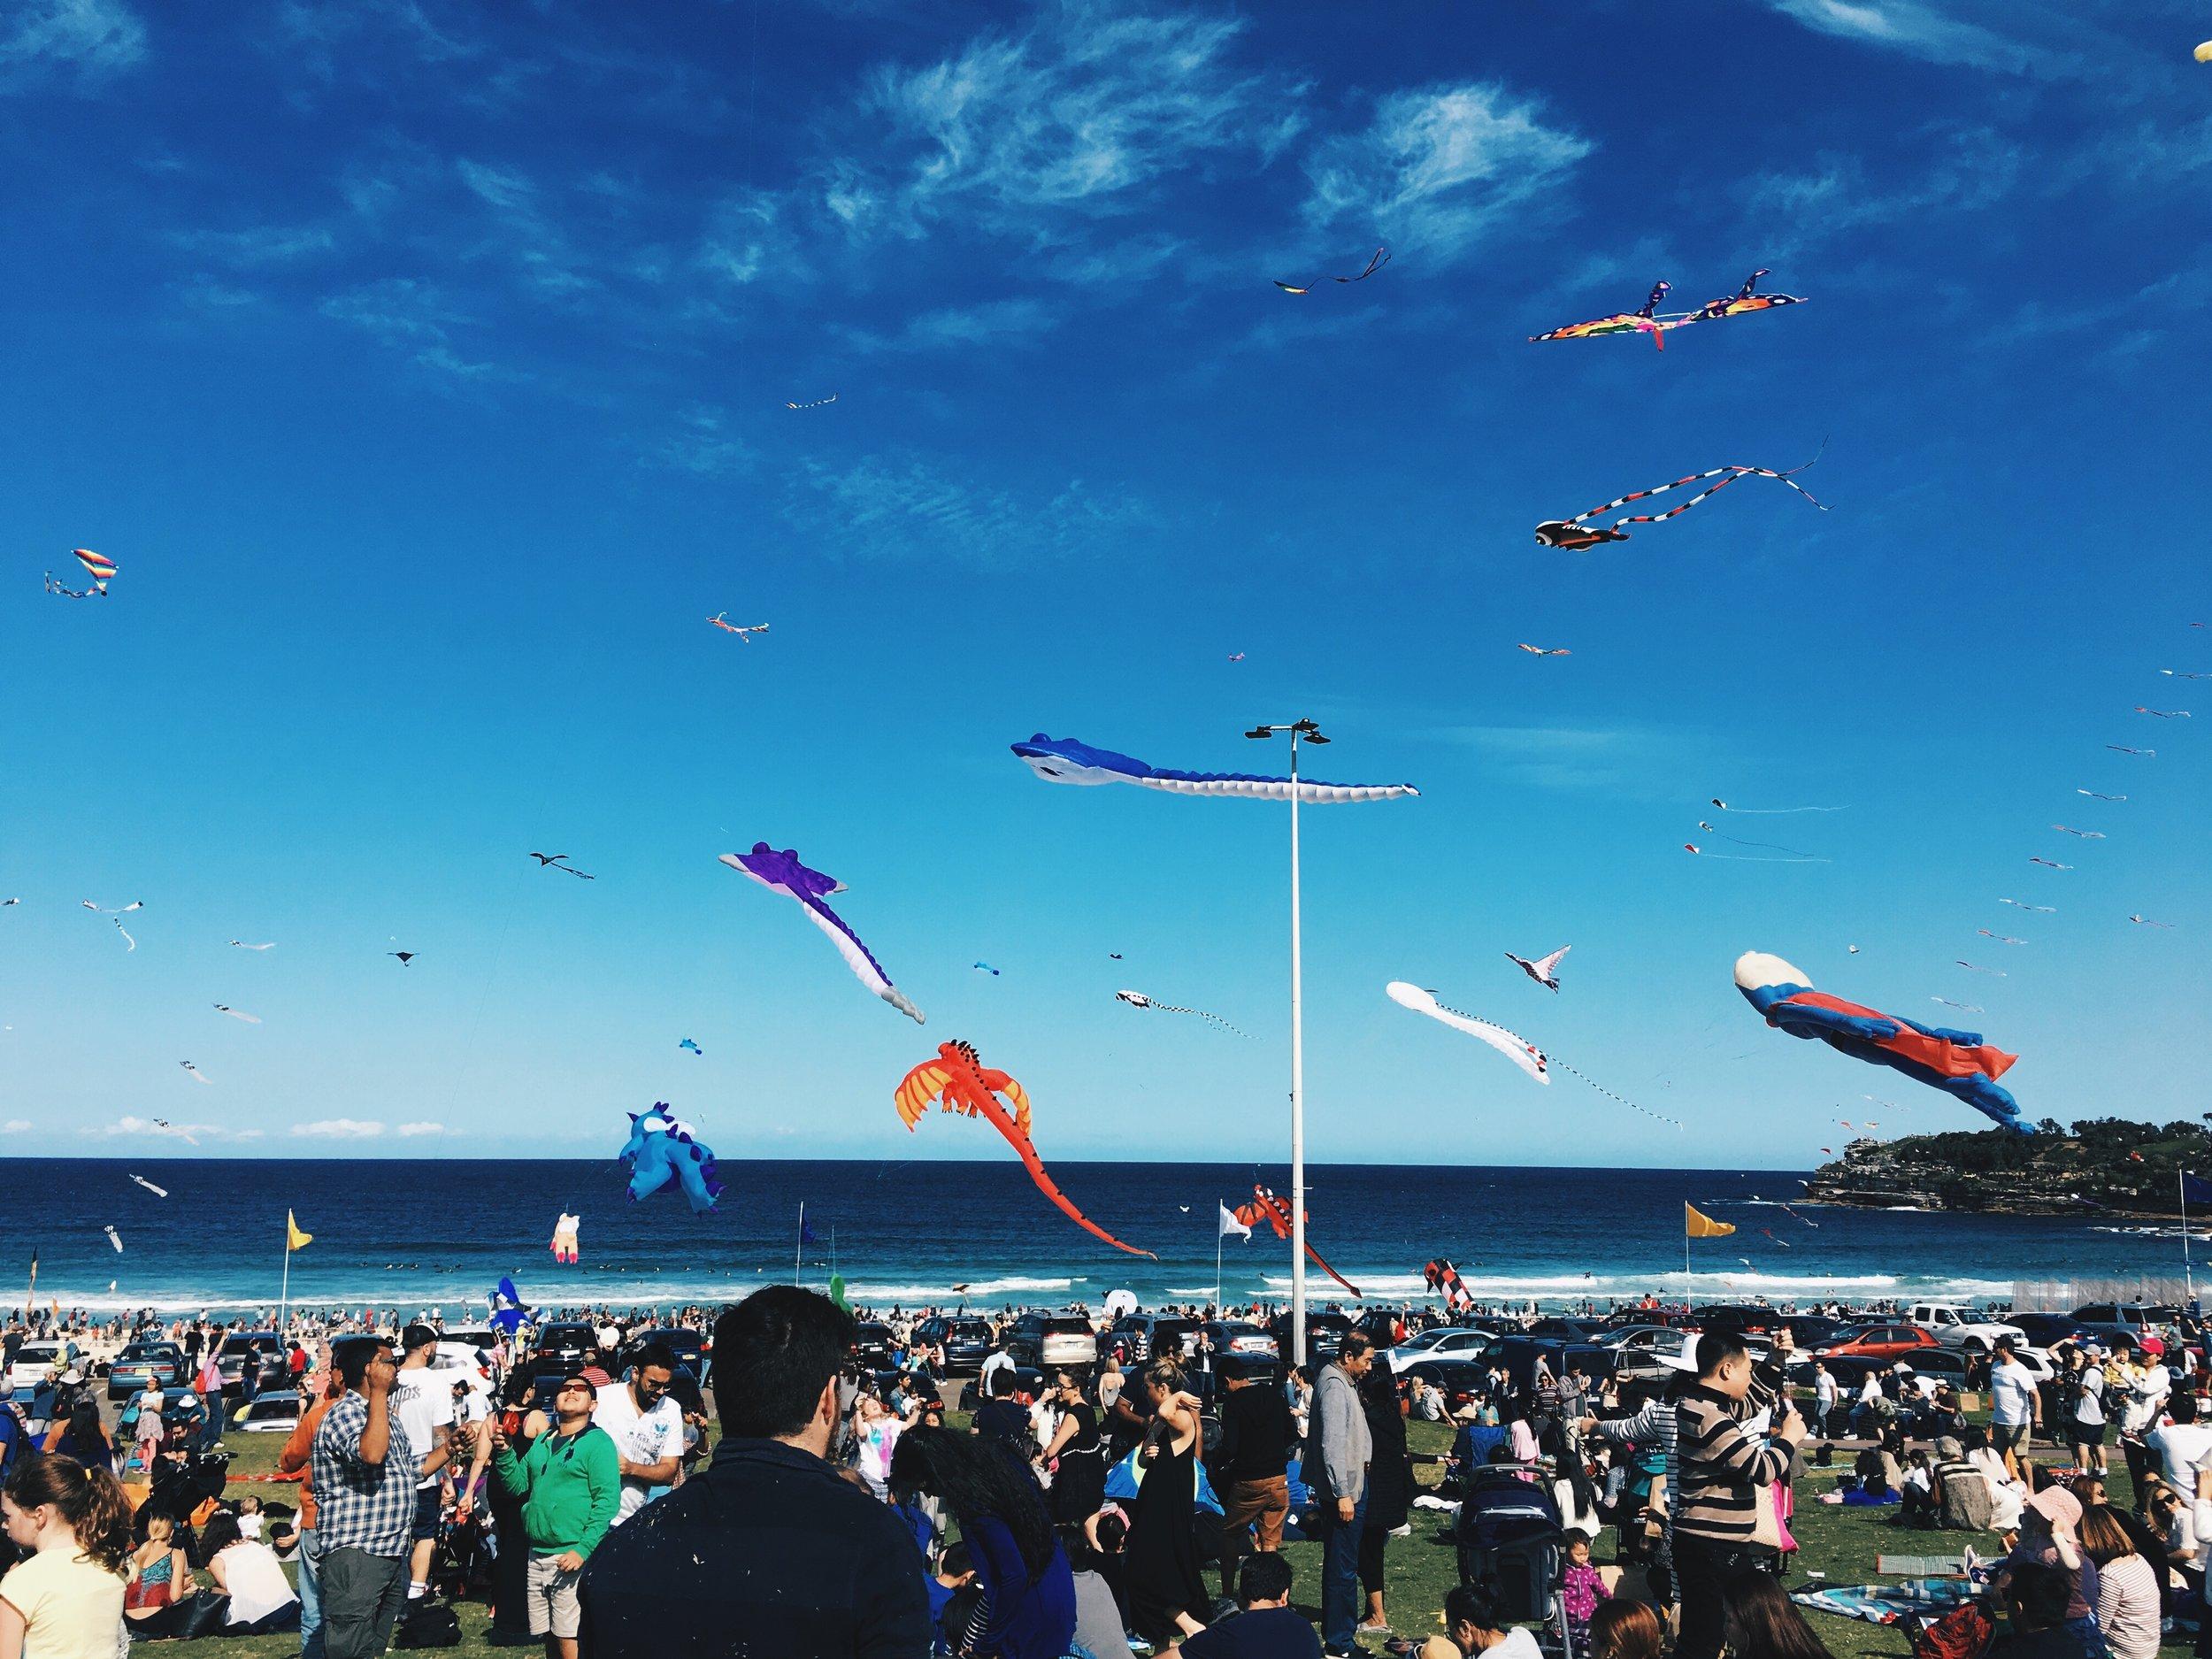 Festival of the Winds at Bondi Beach